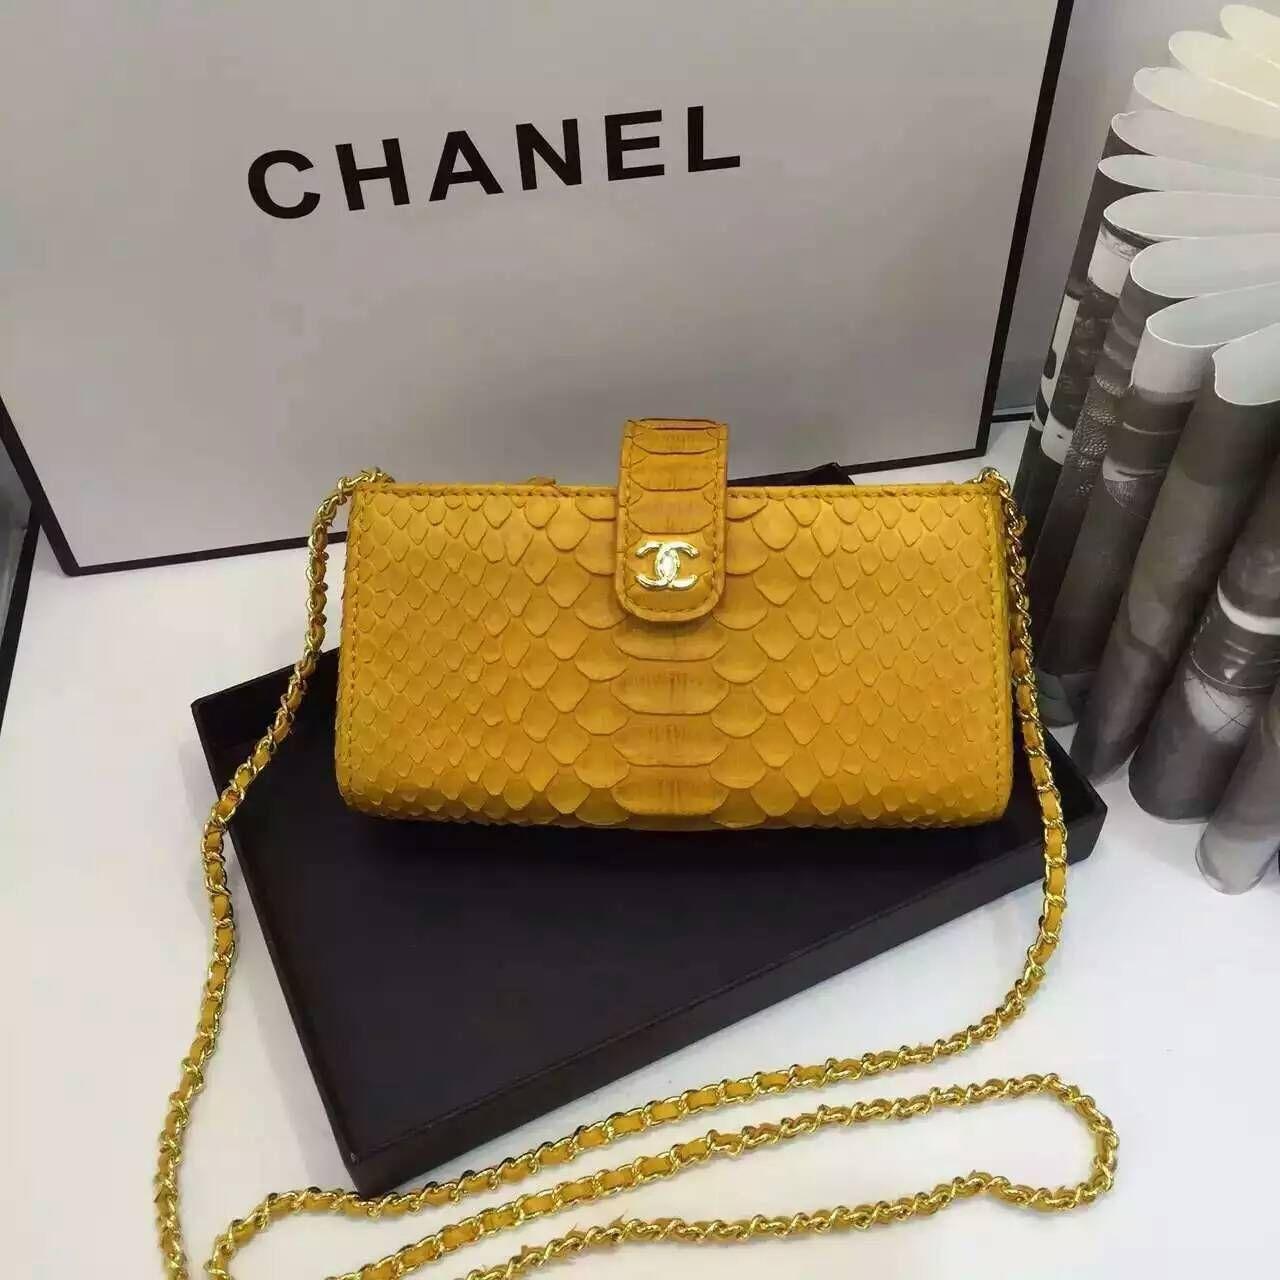 Chanel new style Dinner package dark yellow black  size:18x9x5cm CH3 whatsapp:+8615503787453